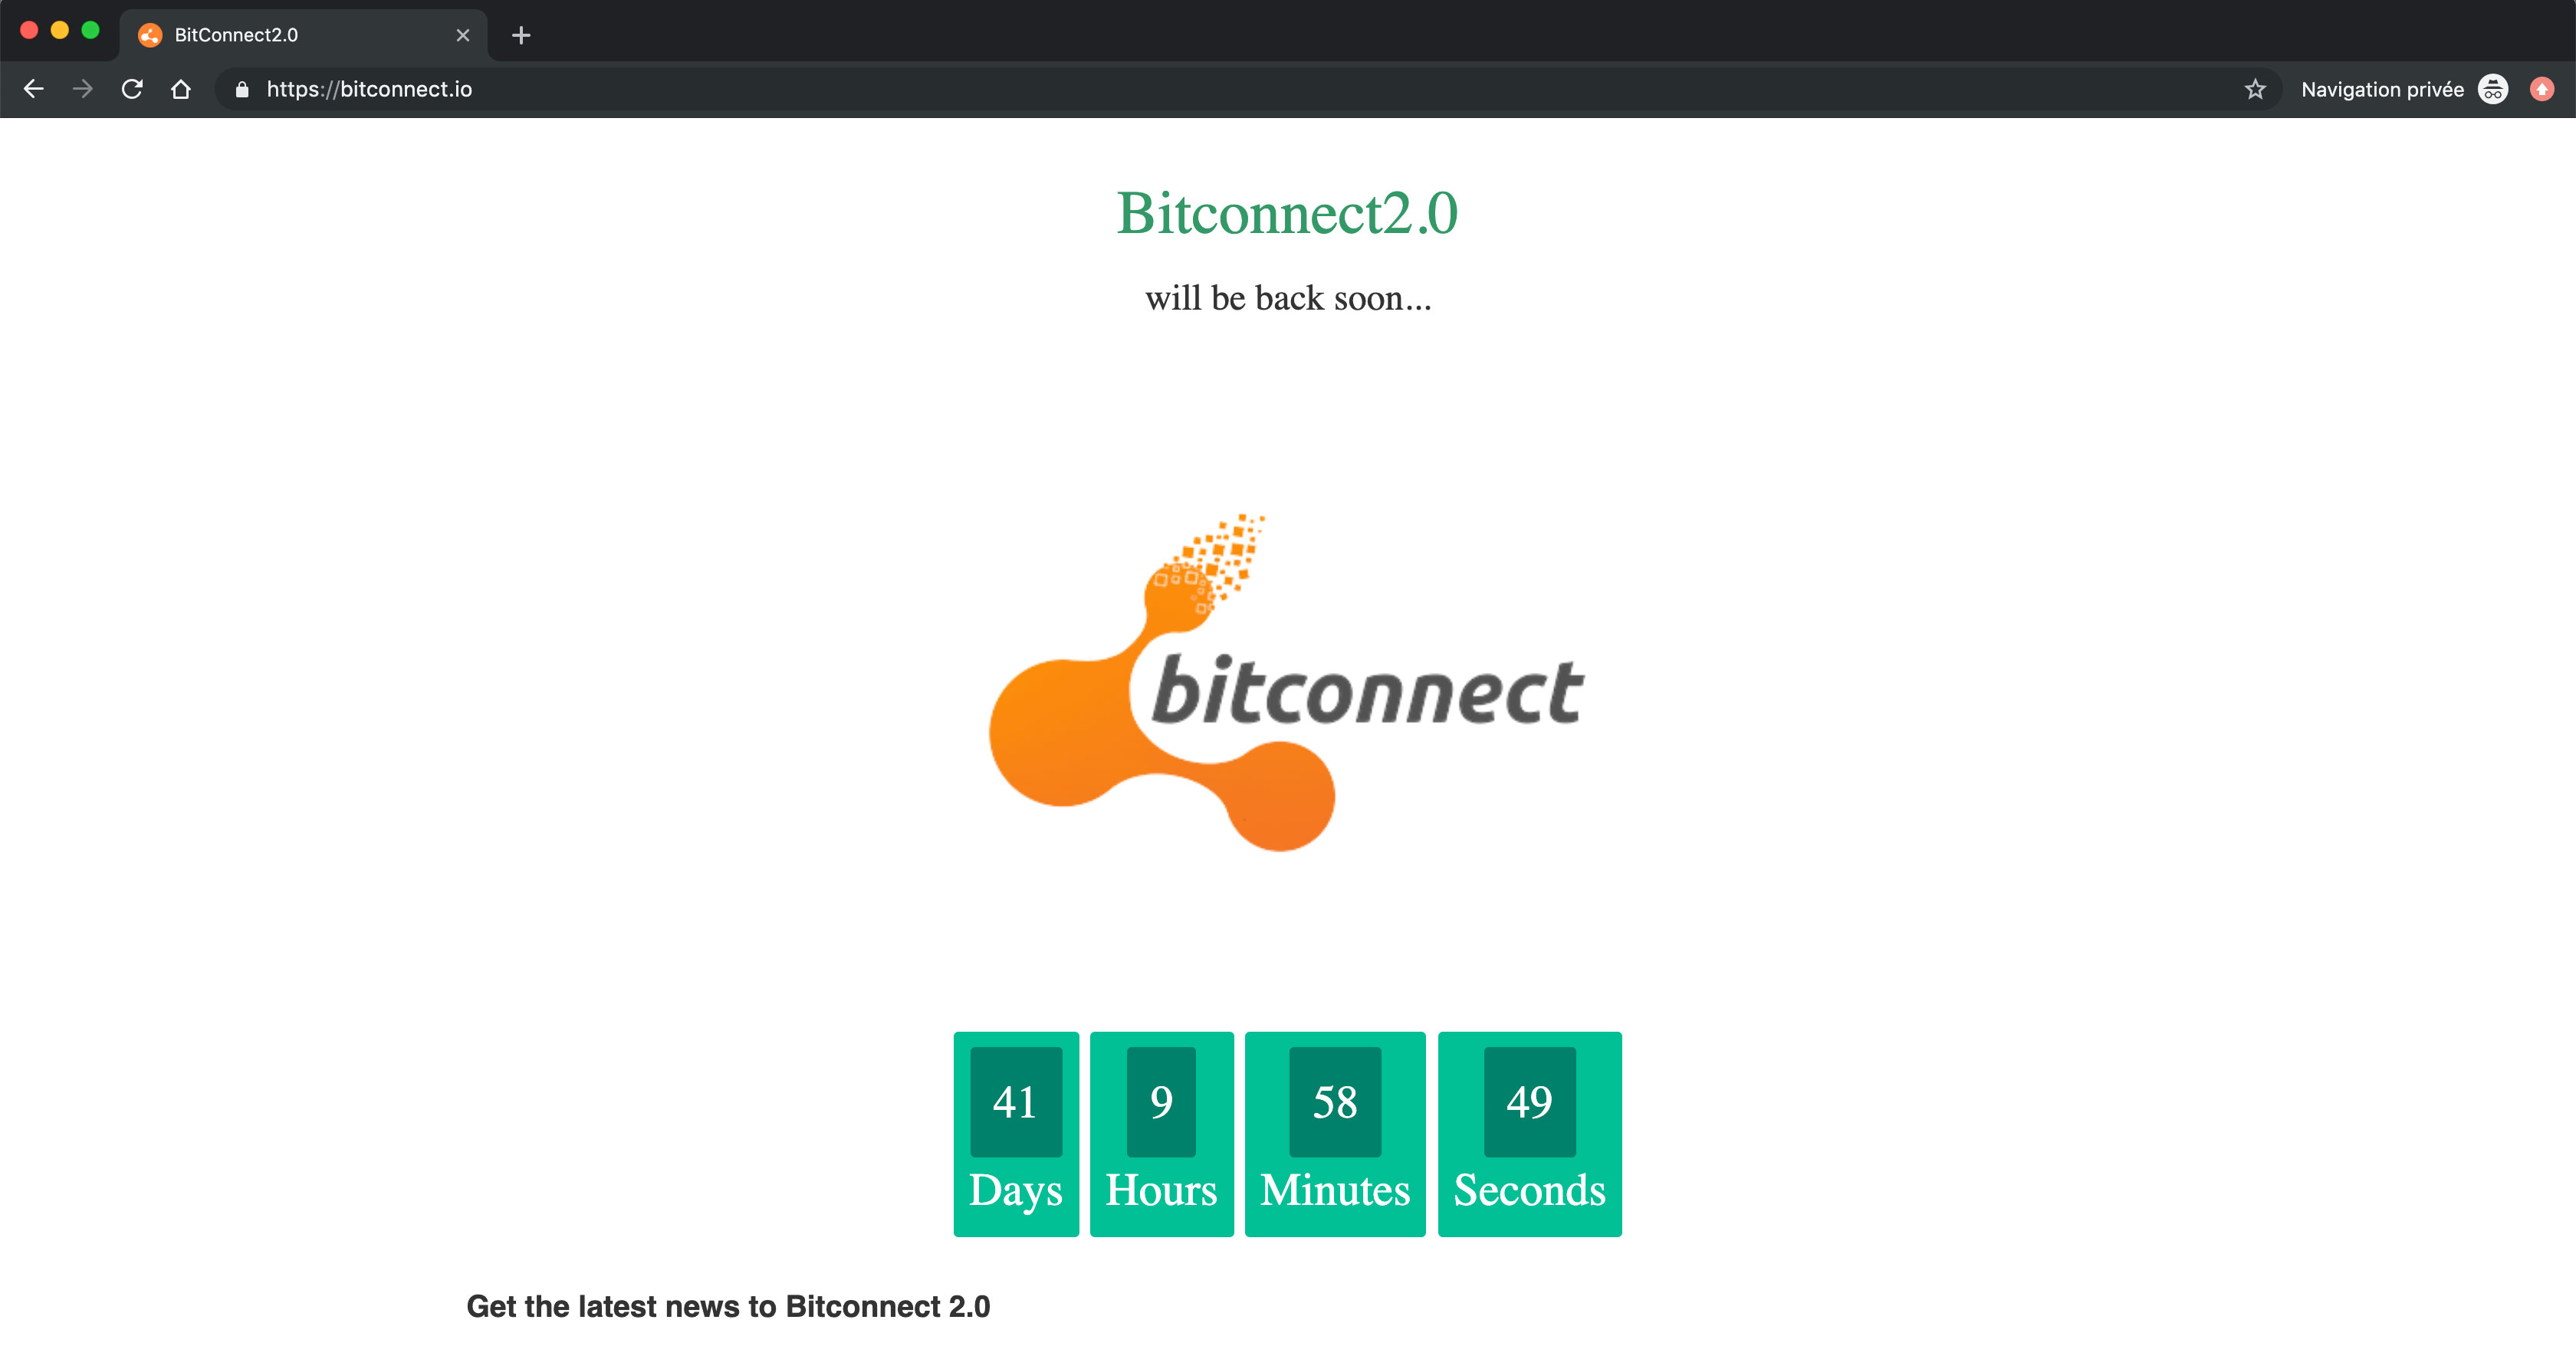 Bitconnect.io